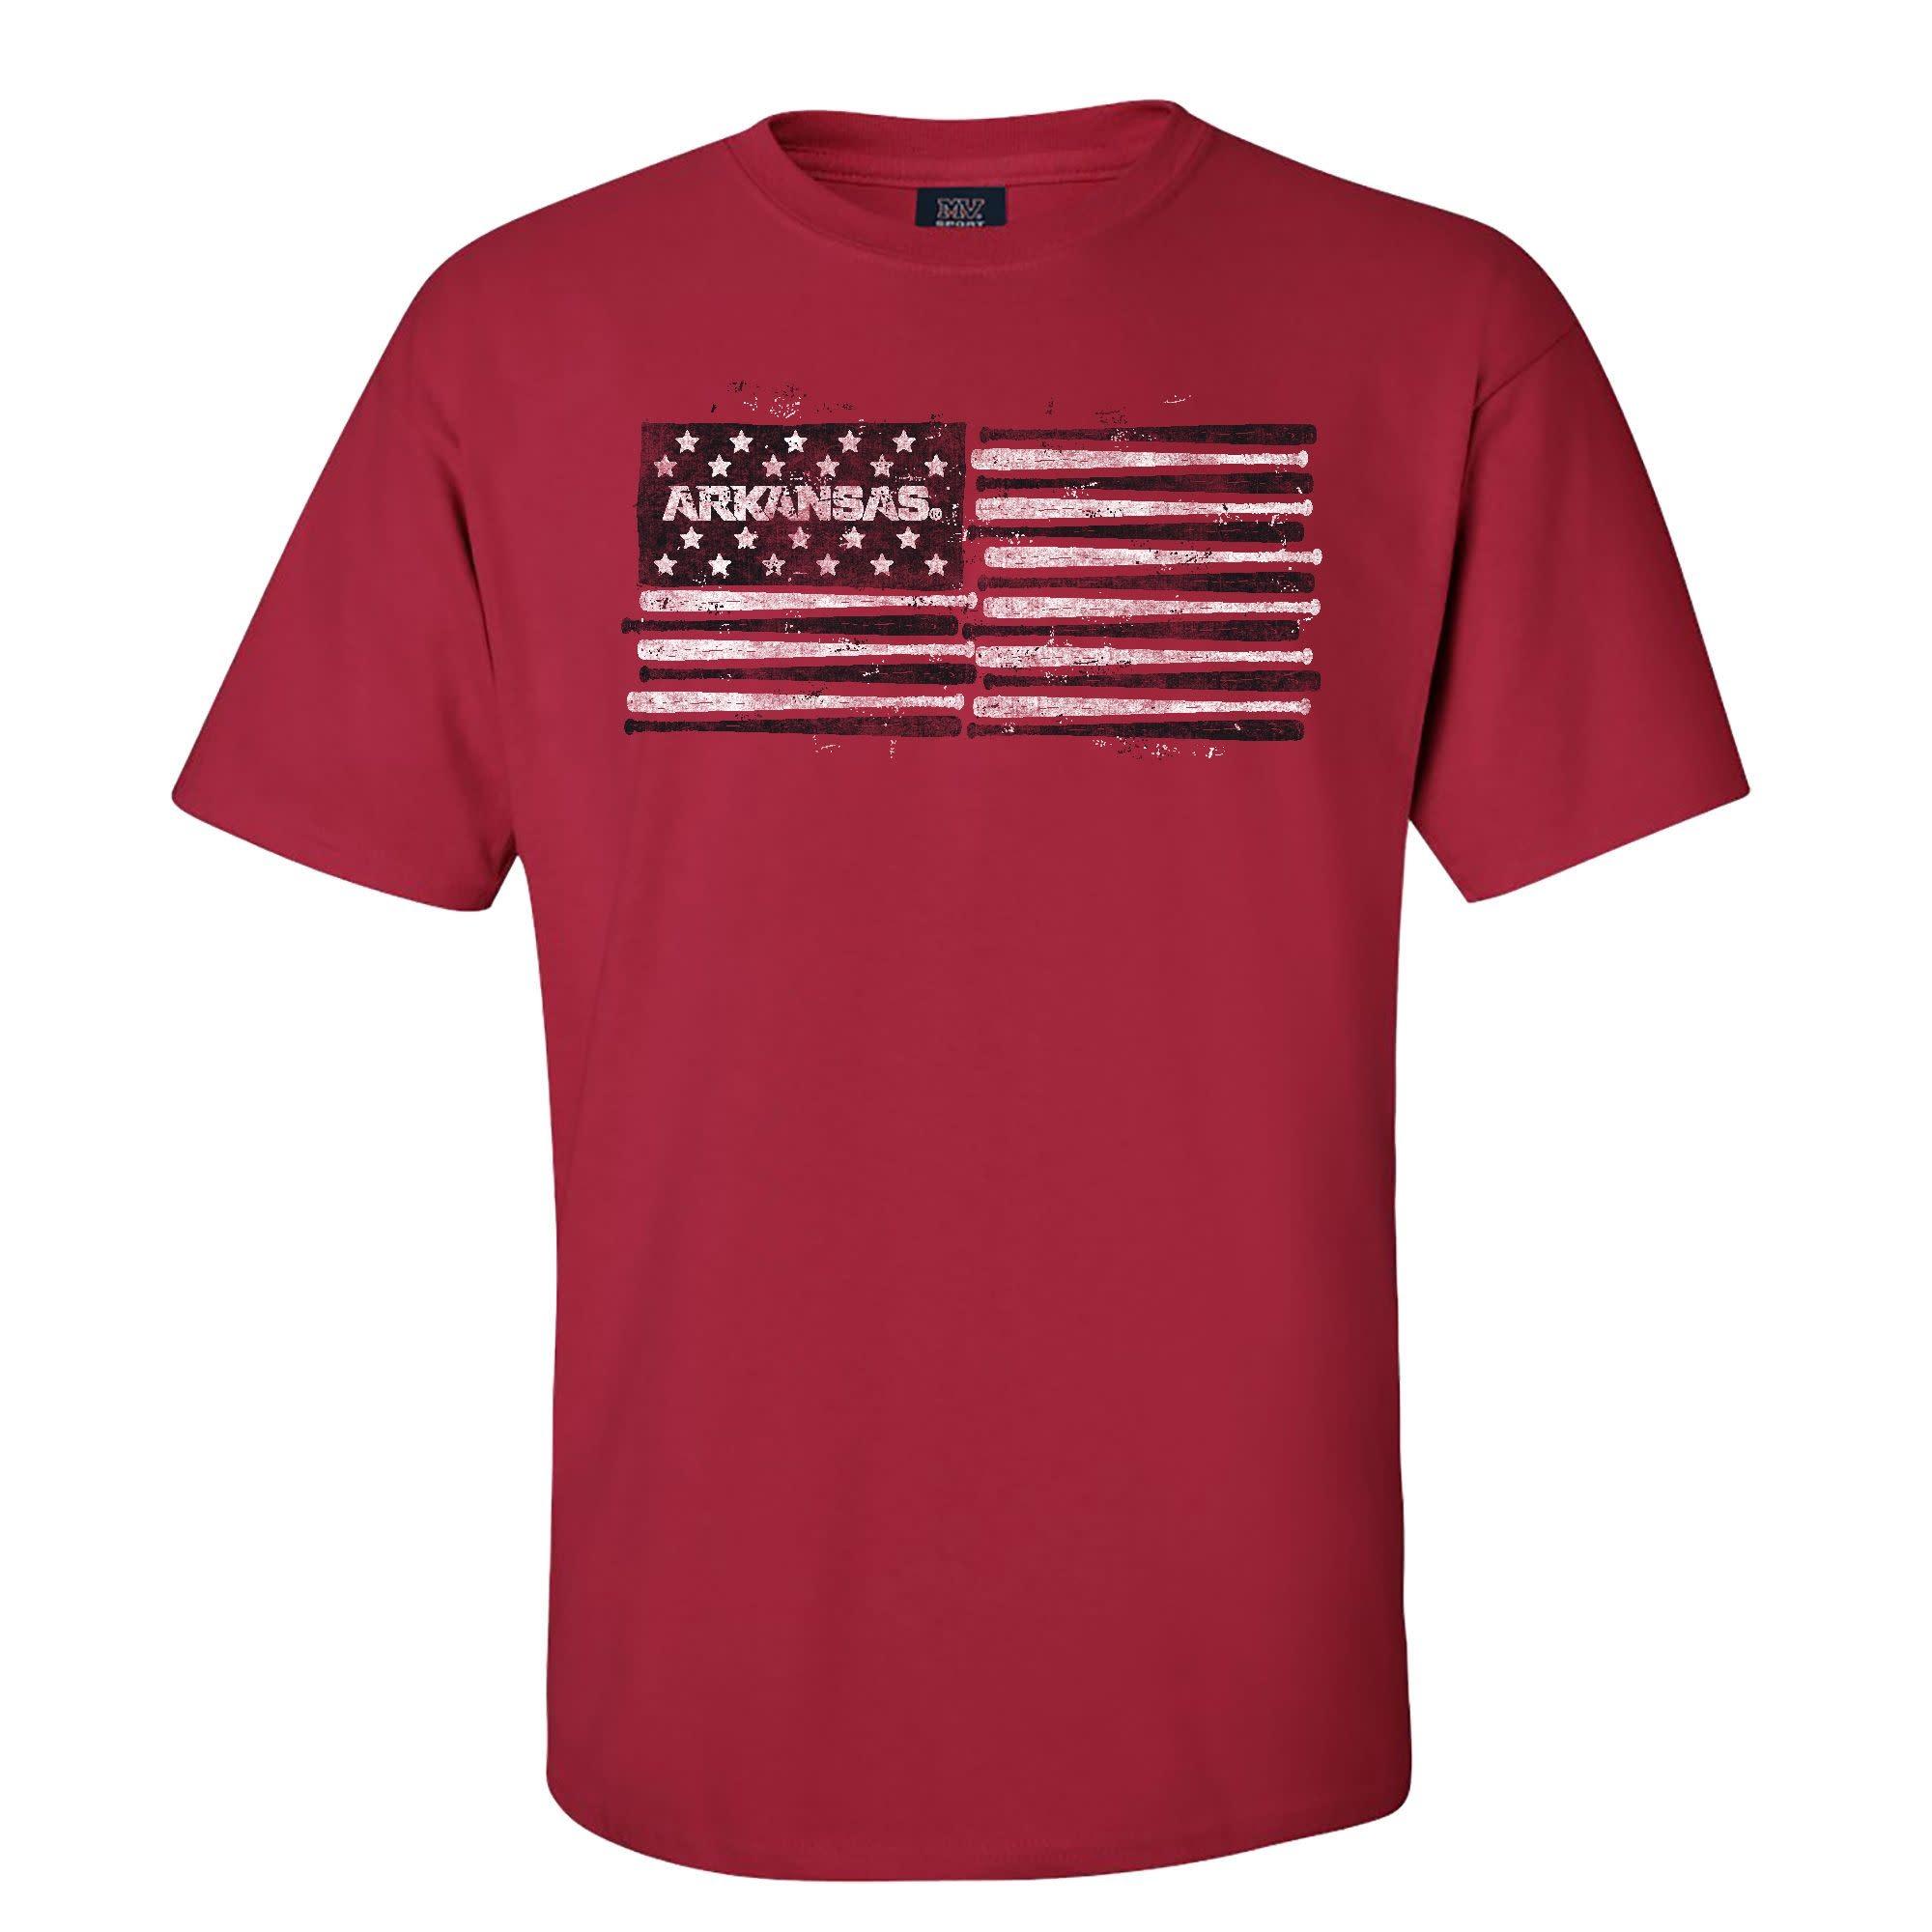 Arkansas Razorback Baseball / Softball Flag Short Sleeve Tee